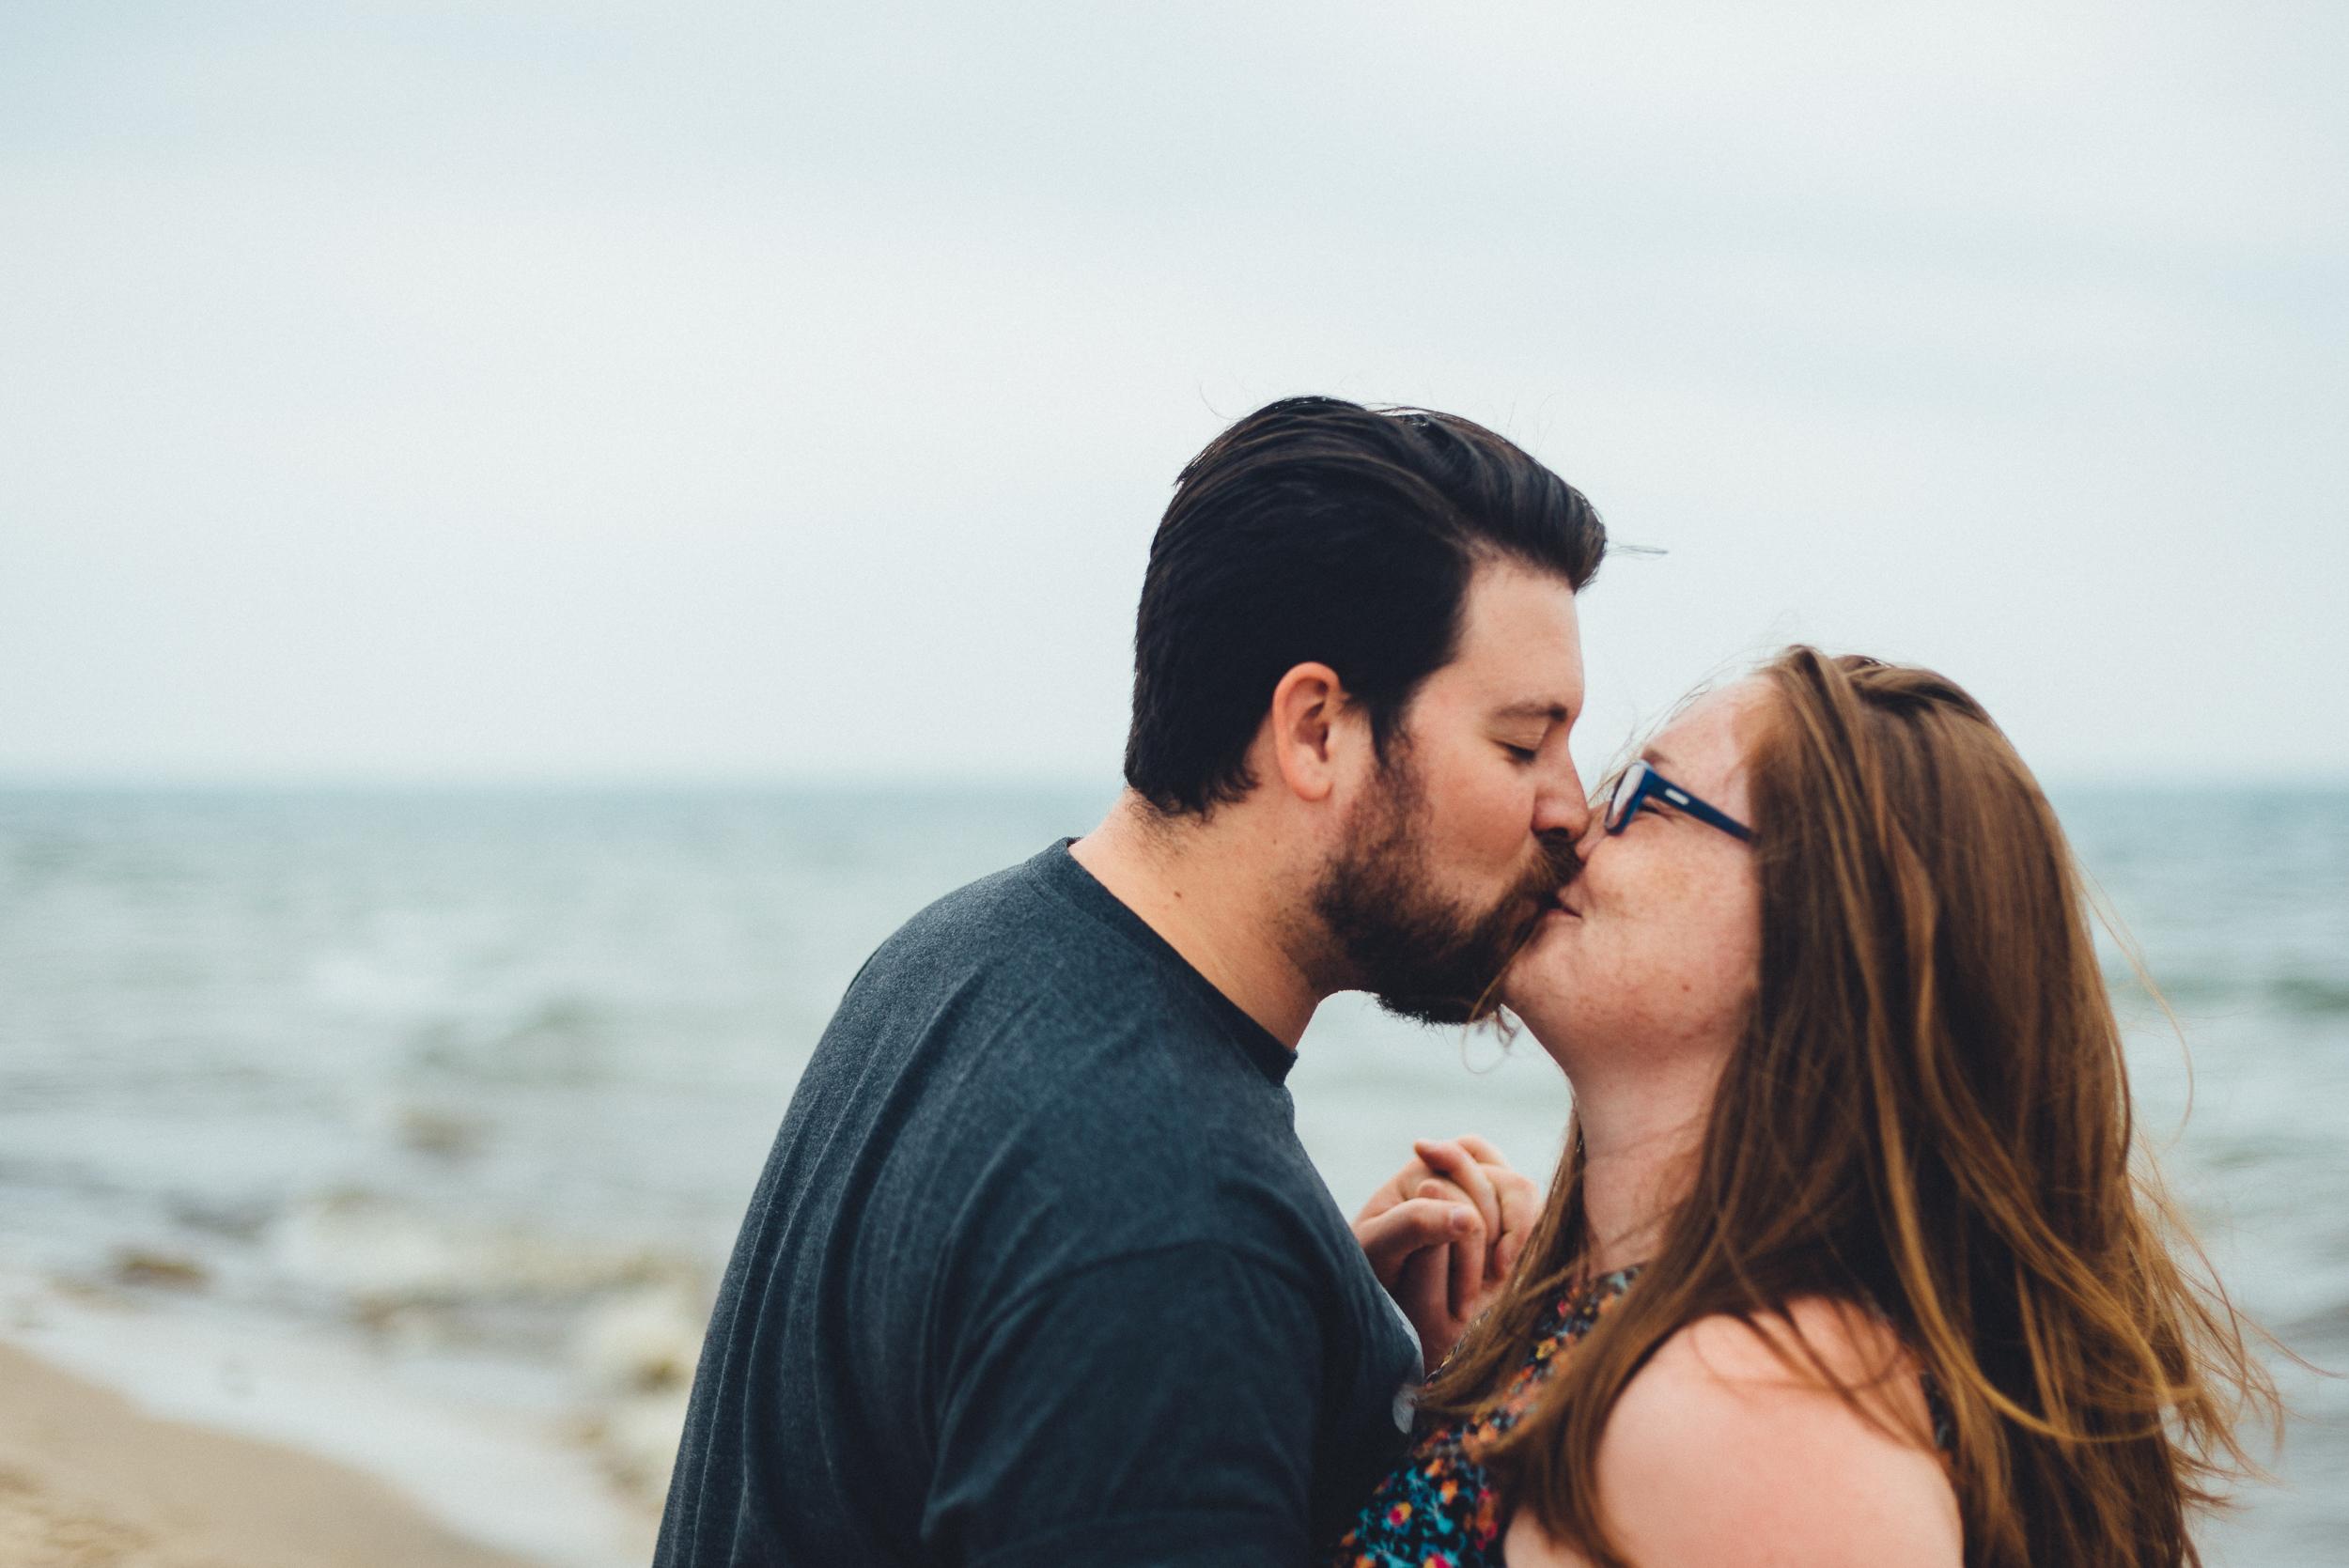 beach_couple_photography_engagment_love_long_island_photographer-19.jpg